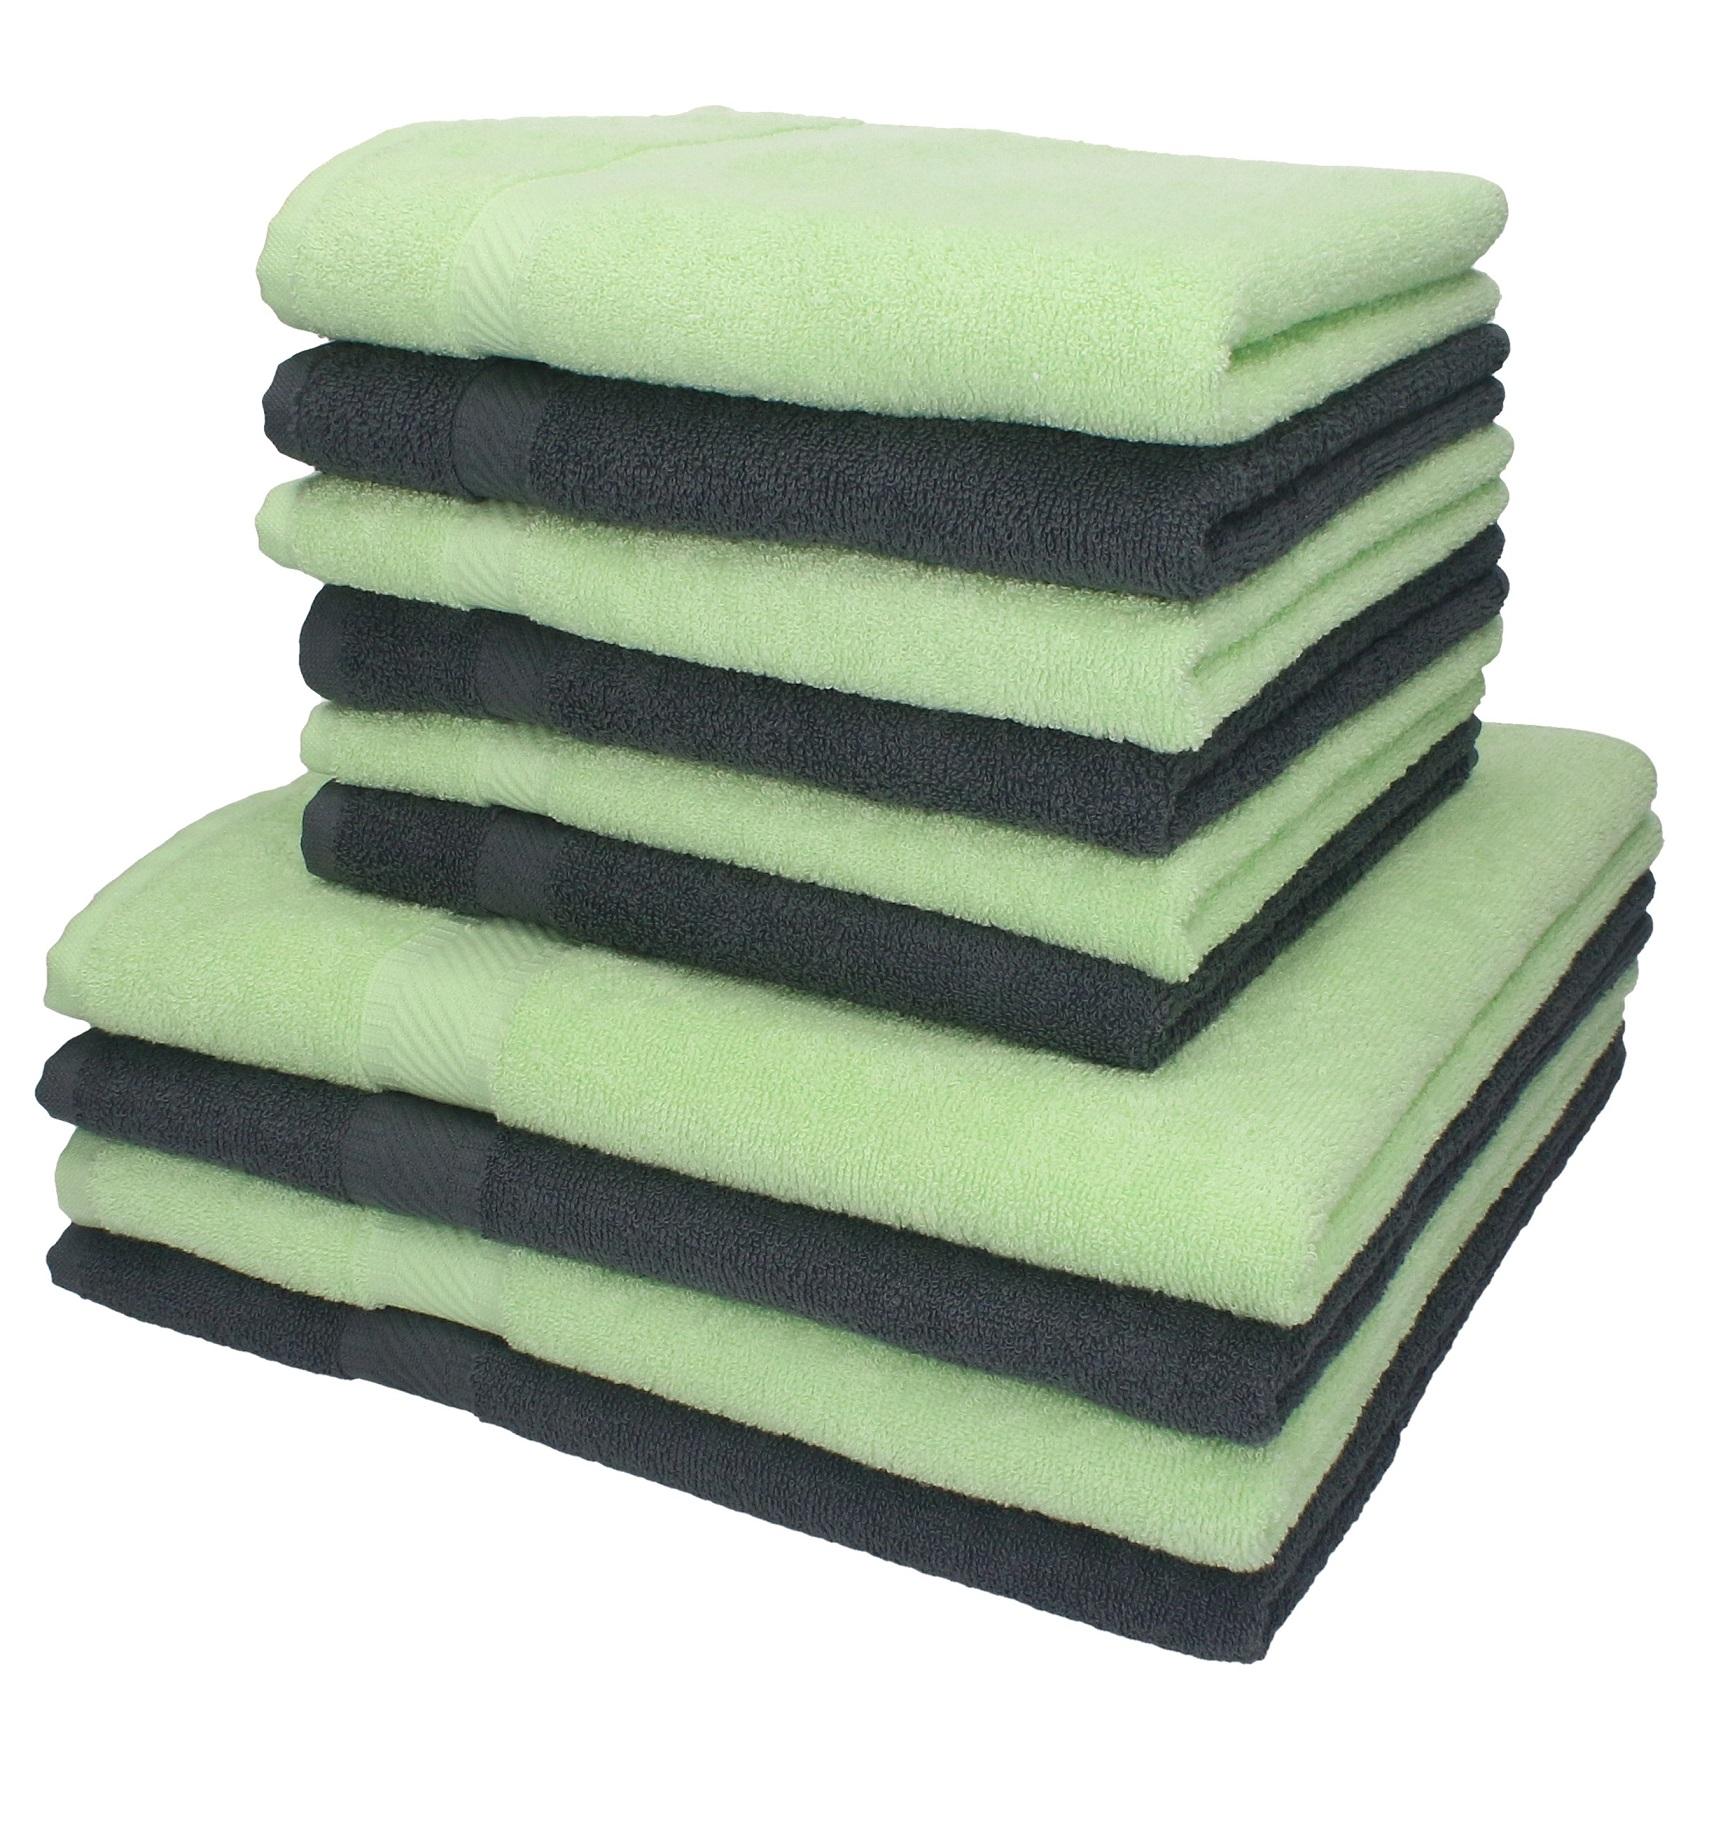 di 10 asciugamani da bagno Palermo: 6 asciugamani e 4 asciugamani ...